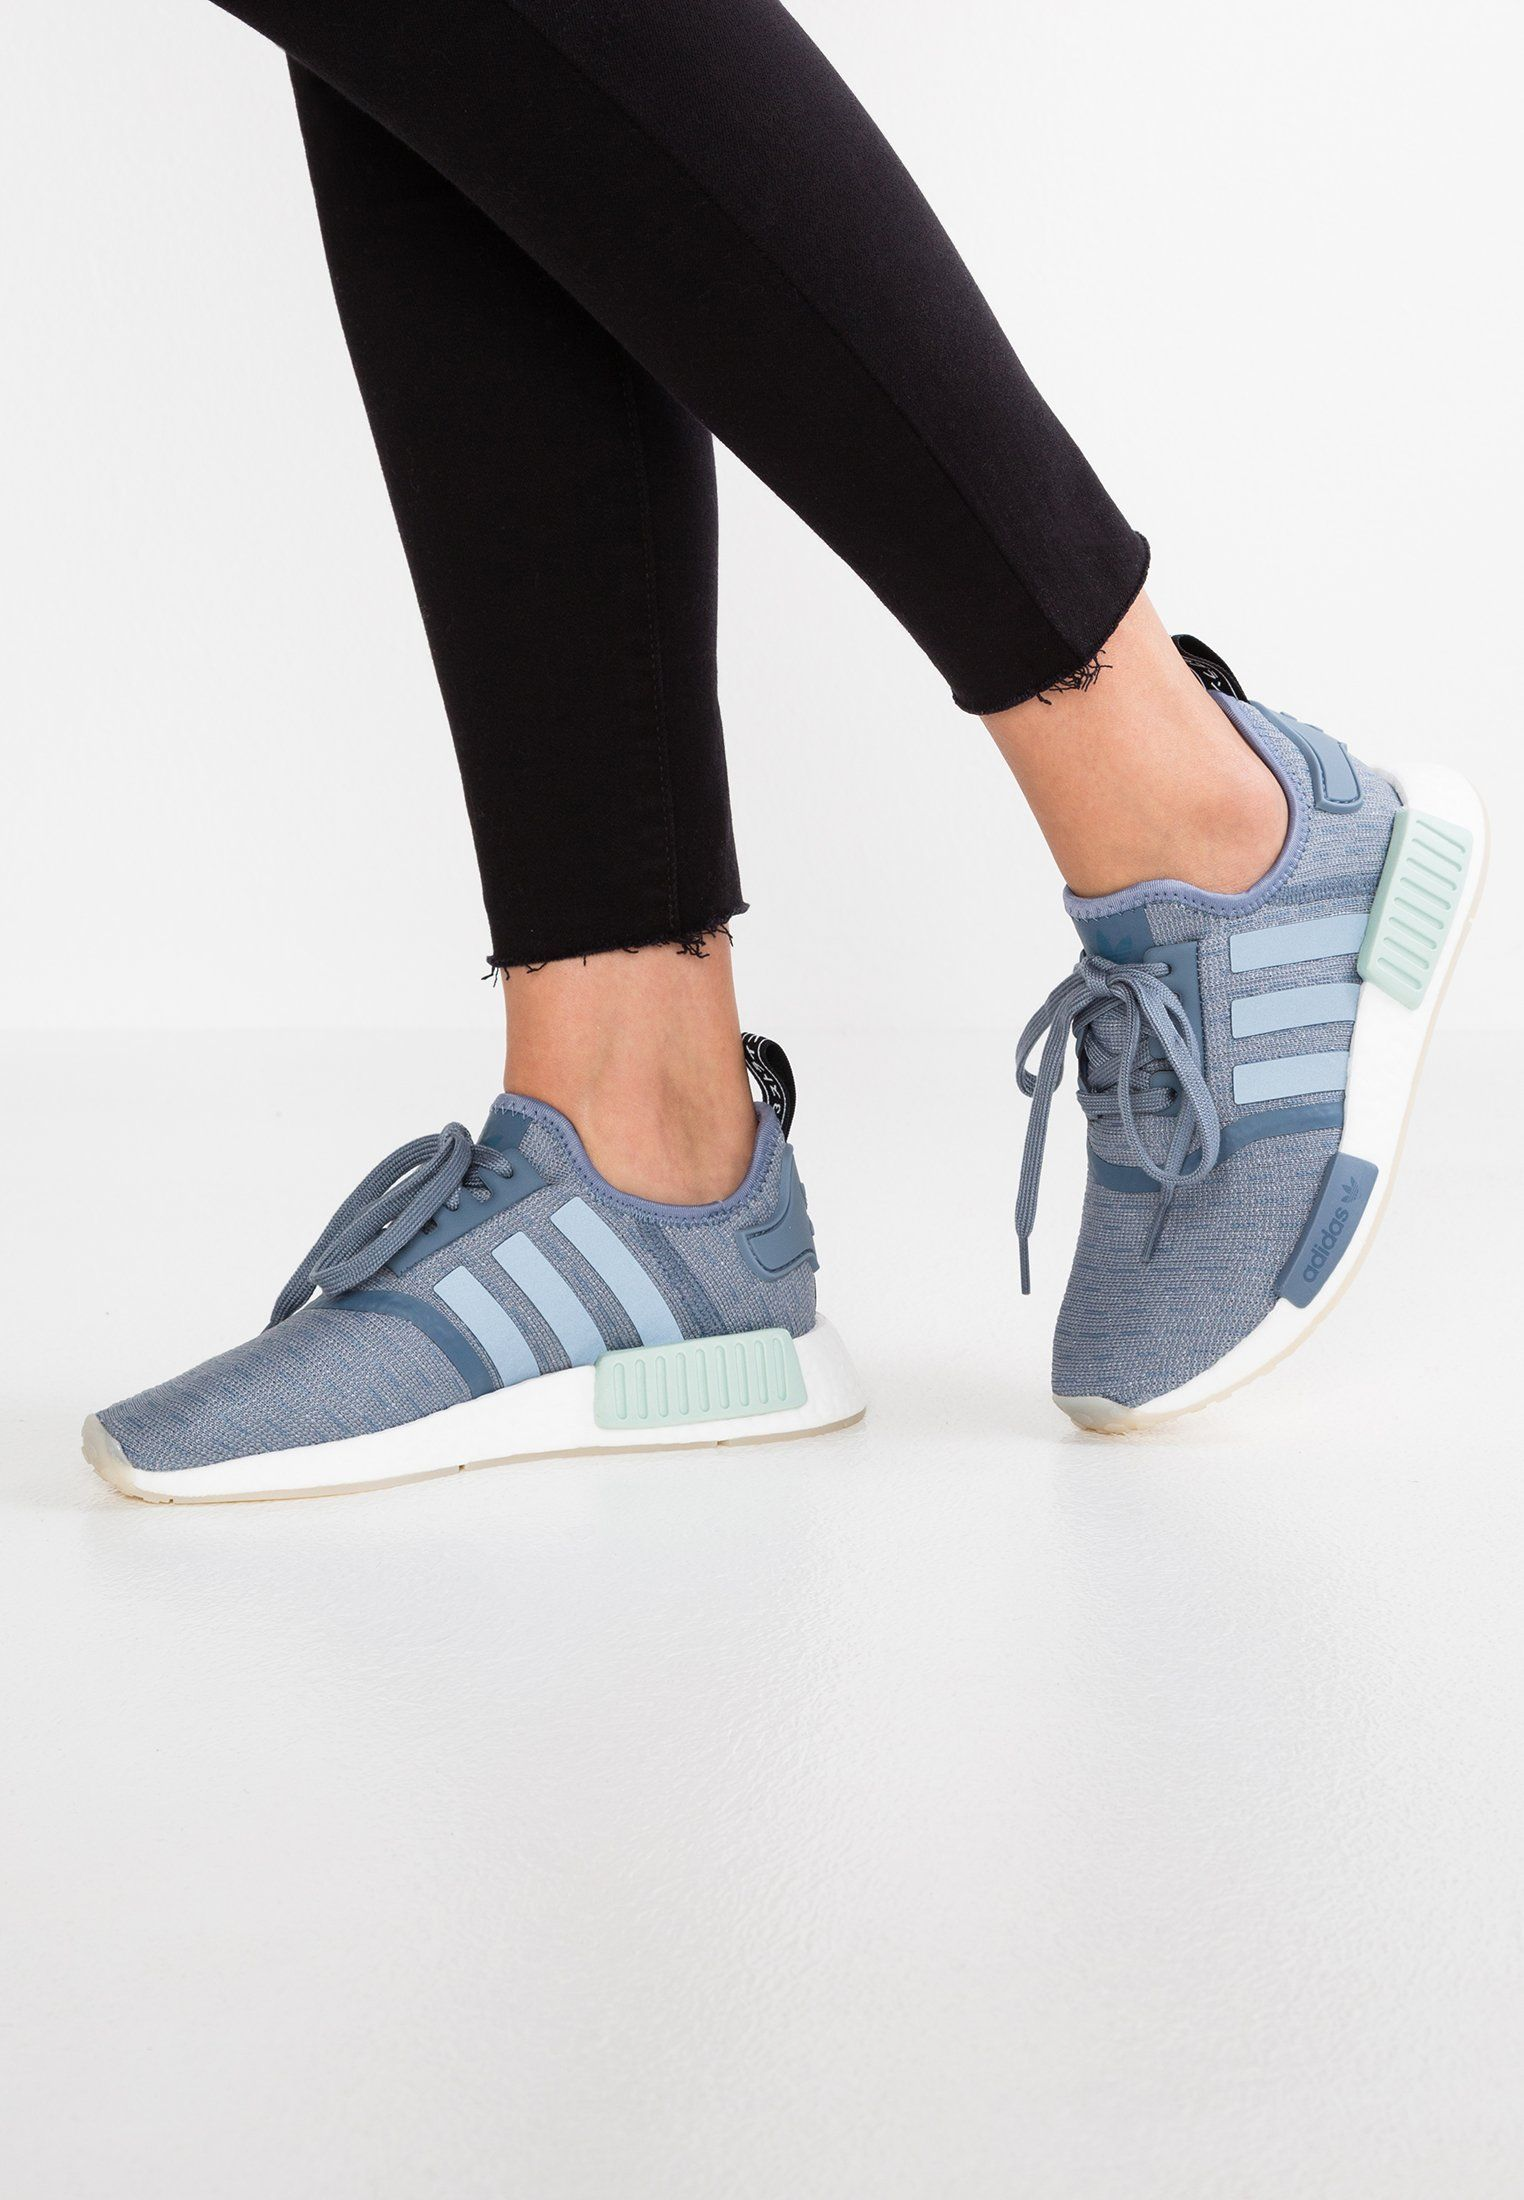 c5713719edf2 adidas Originals NMD R1 - Trainers - raw steel footwear white -  Zalando.co.uk